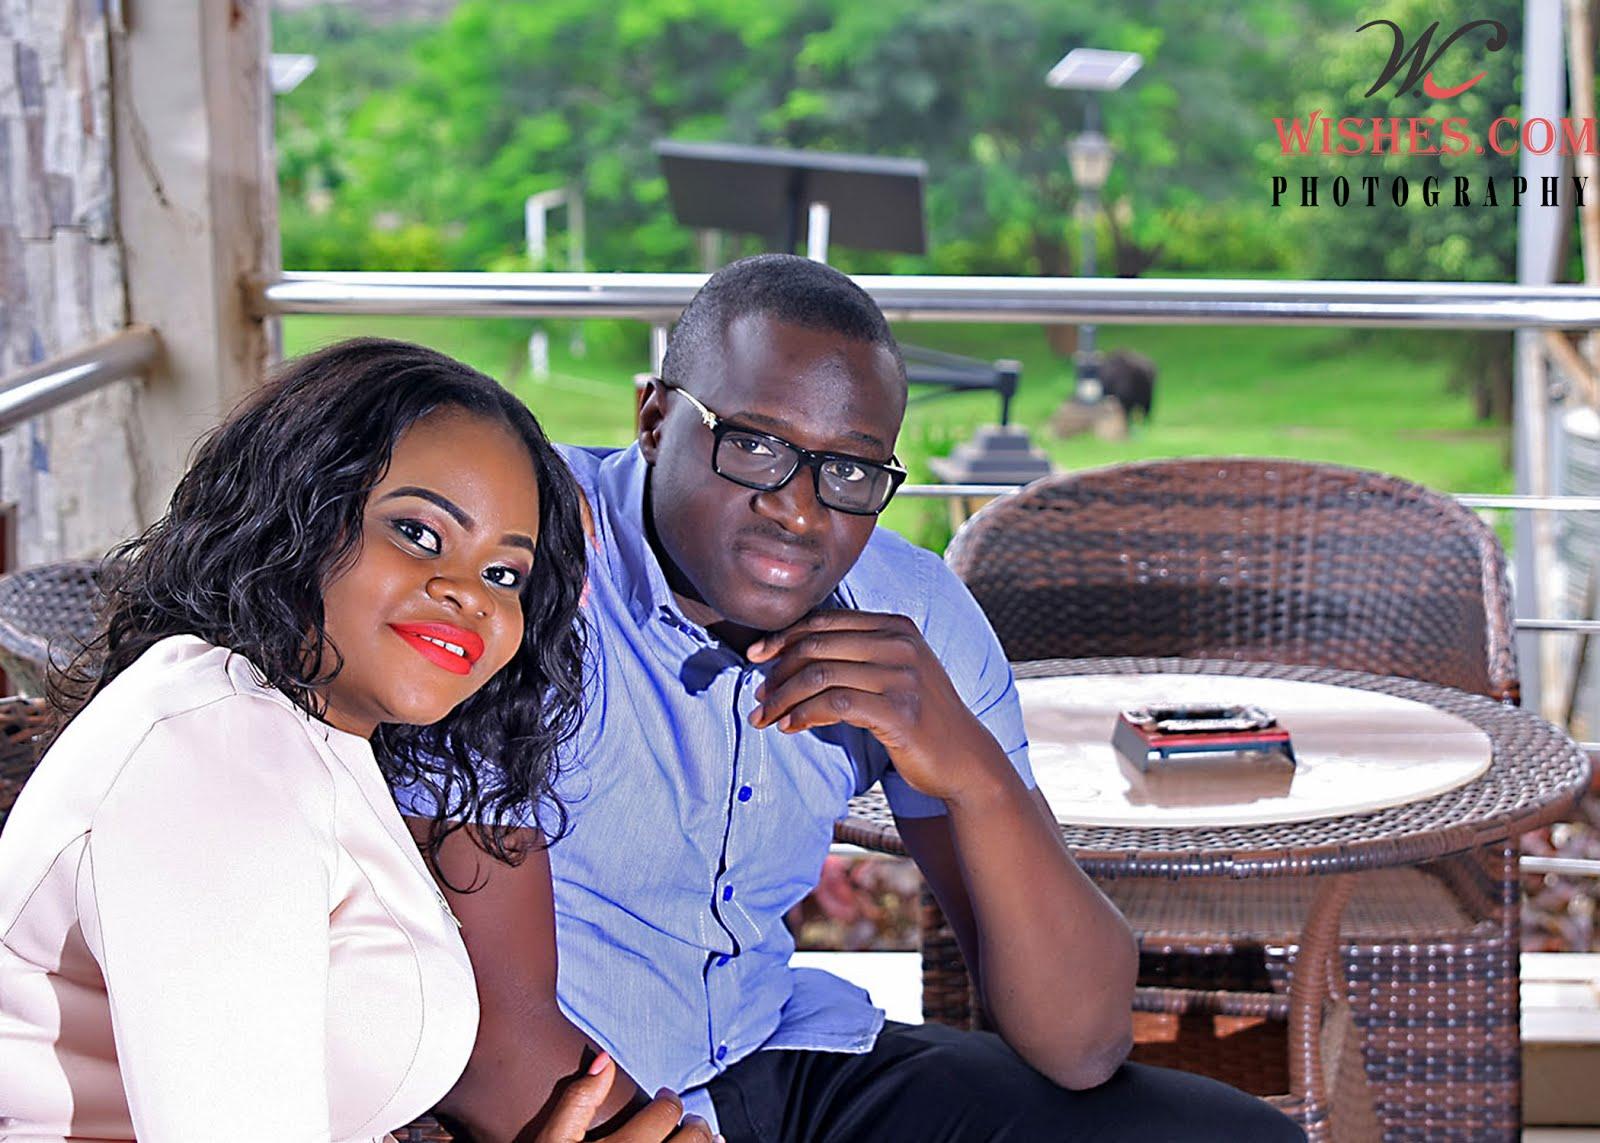 Gbenga & Ronke (lovely couple)